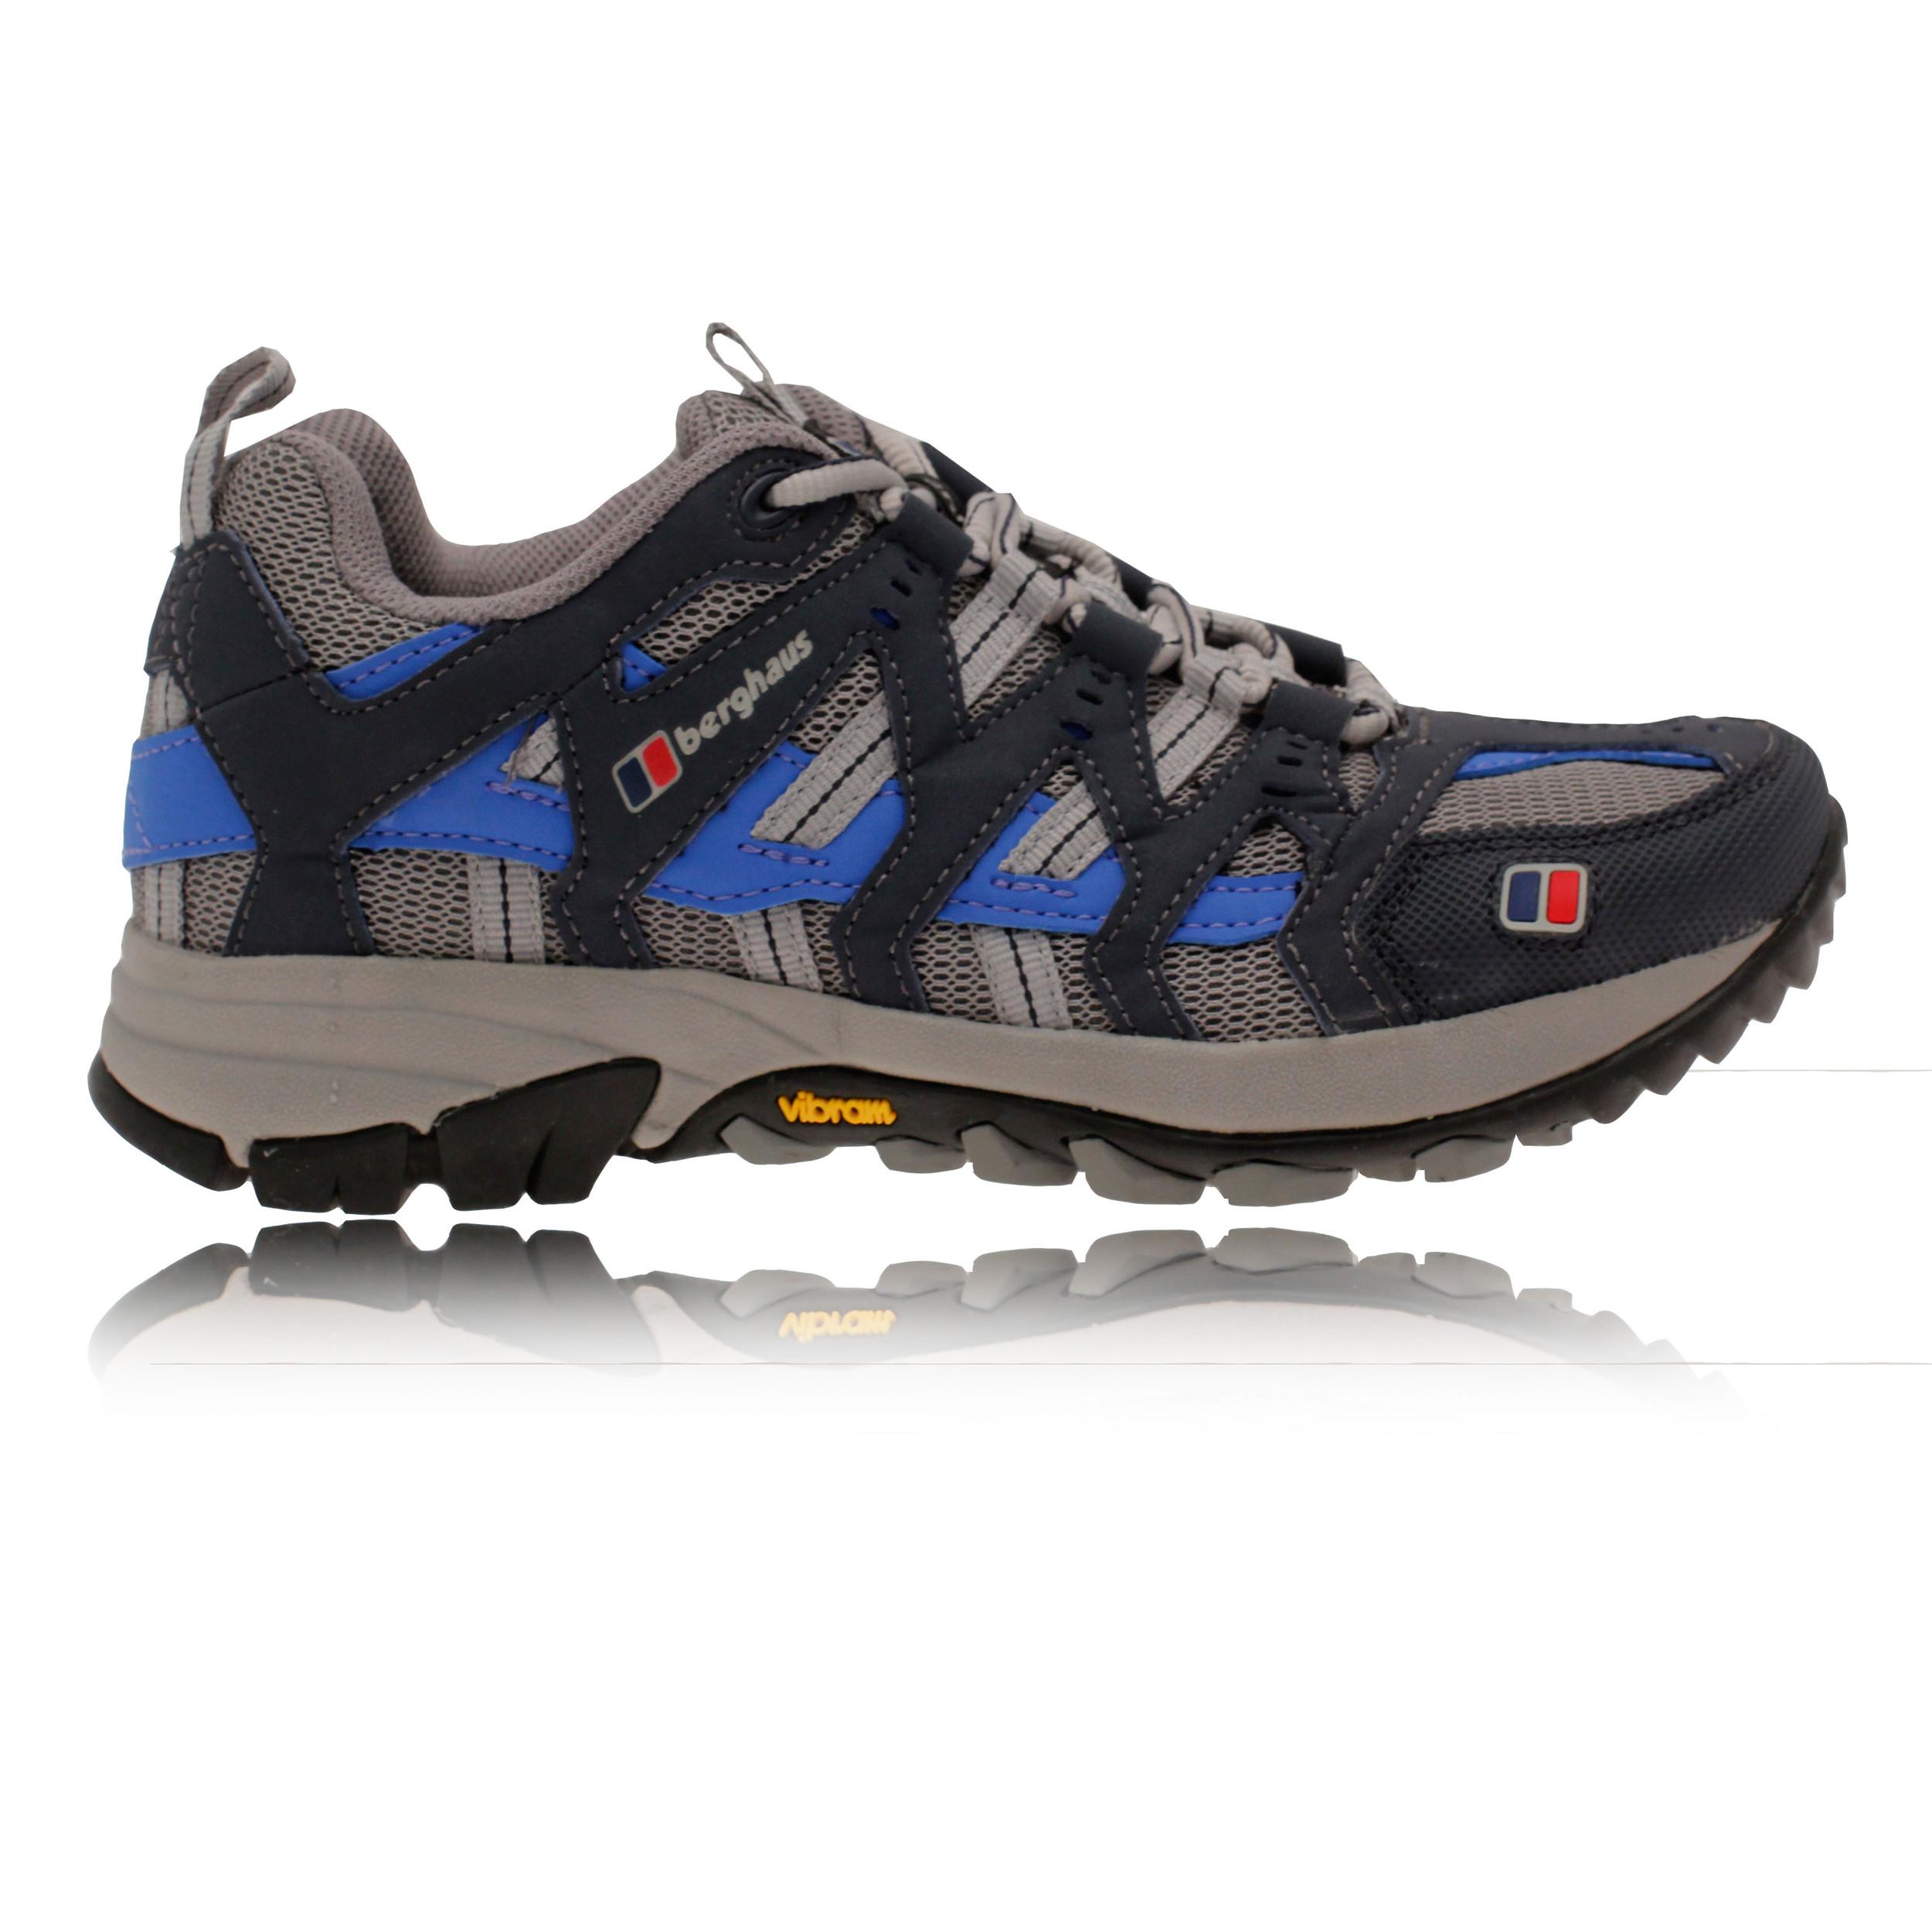 Berghaus Prognosis Tech Women S Walking Shoes